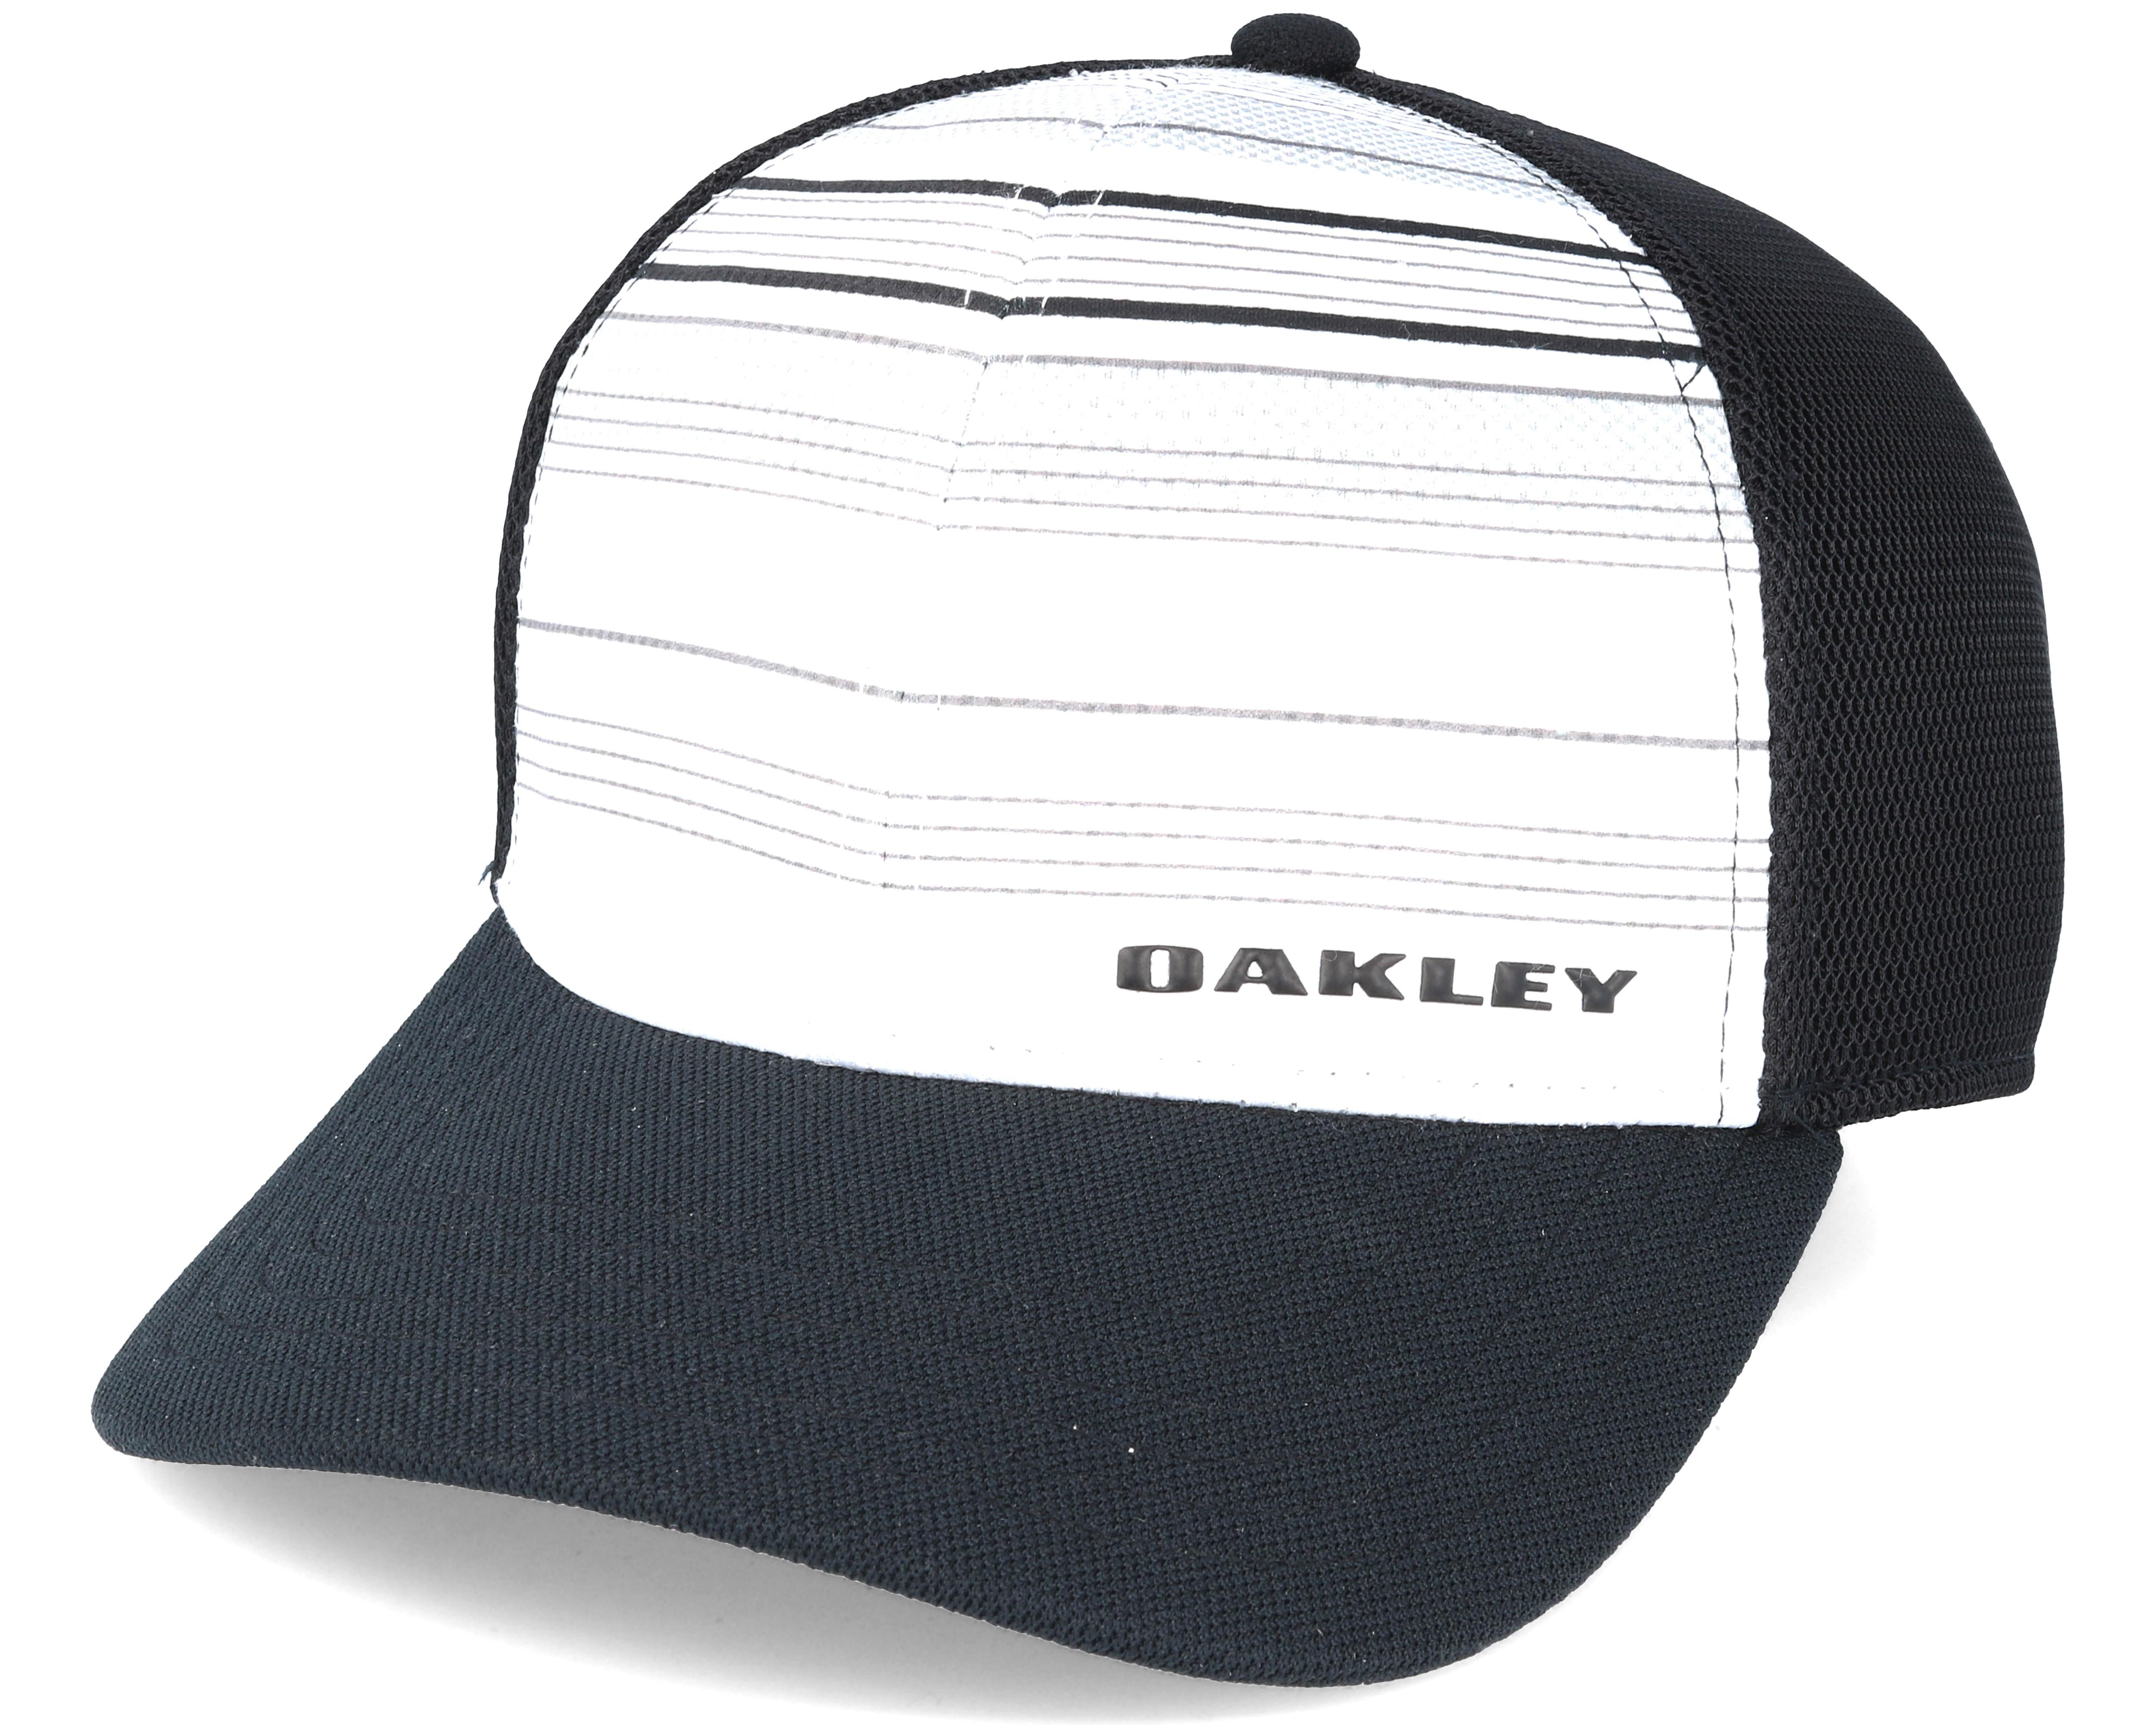 Silicone Bark Trucker Print 2.0 White Black Flexfit - Oakley caps ... 46332324a94